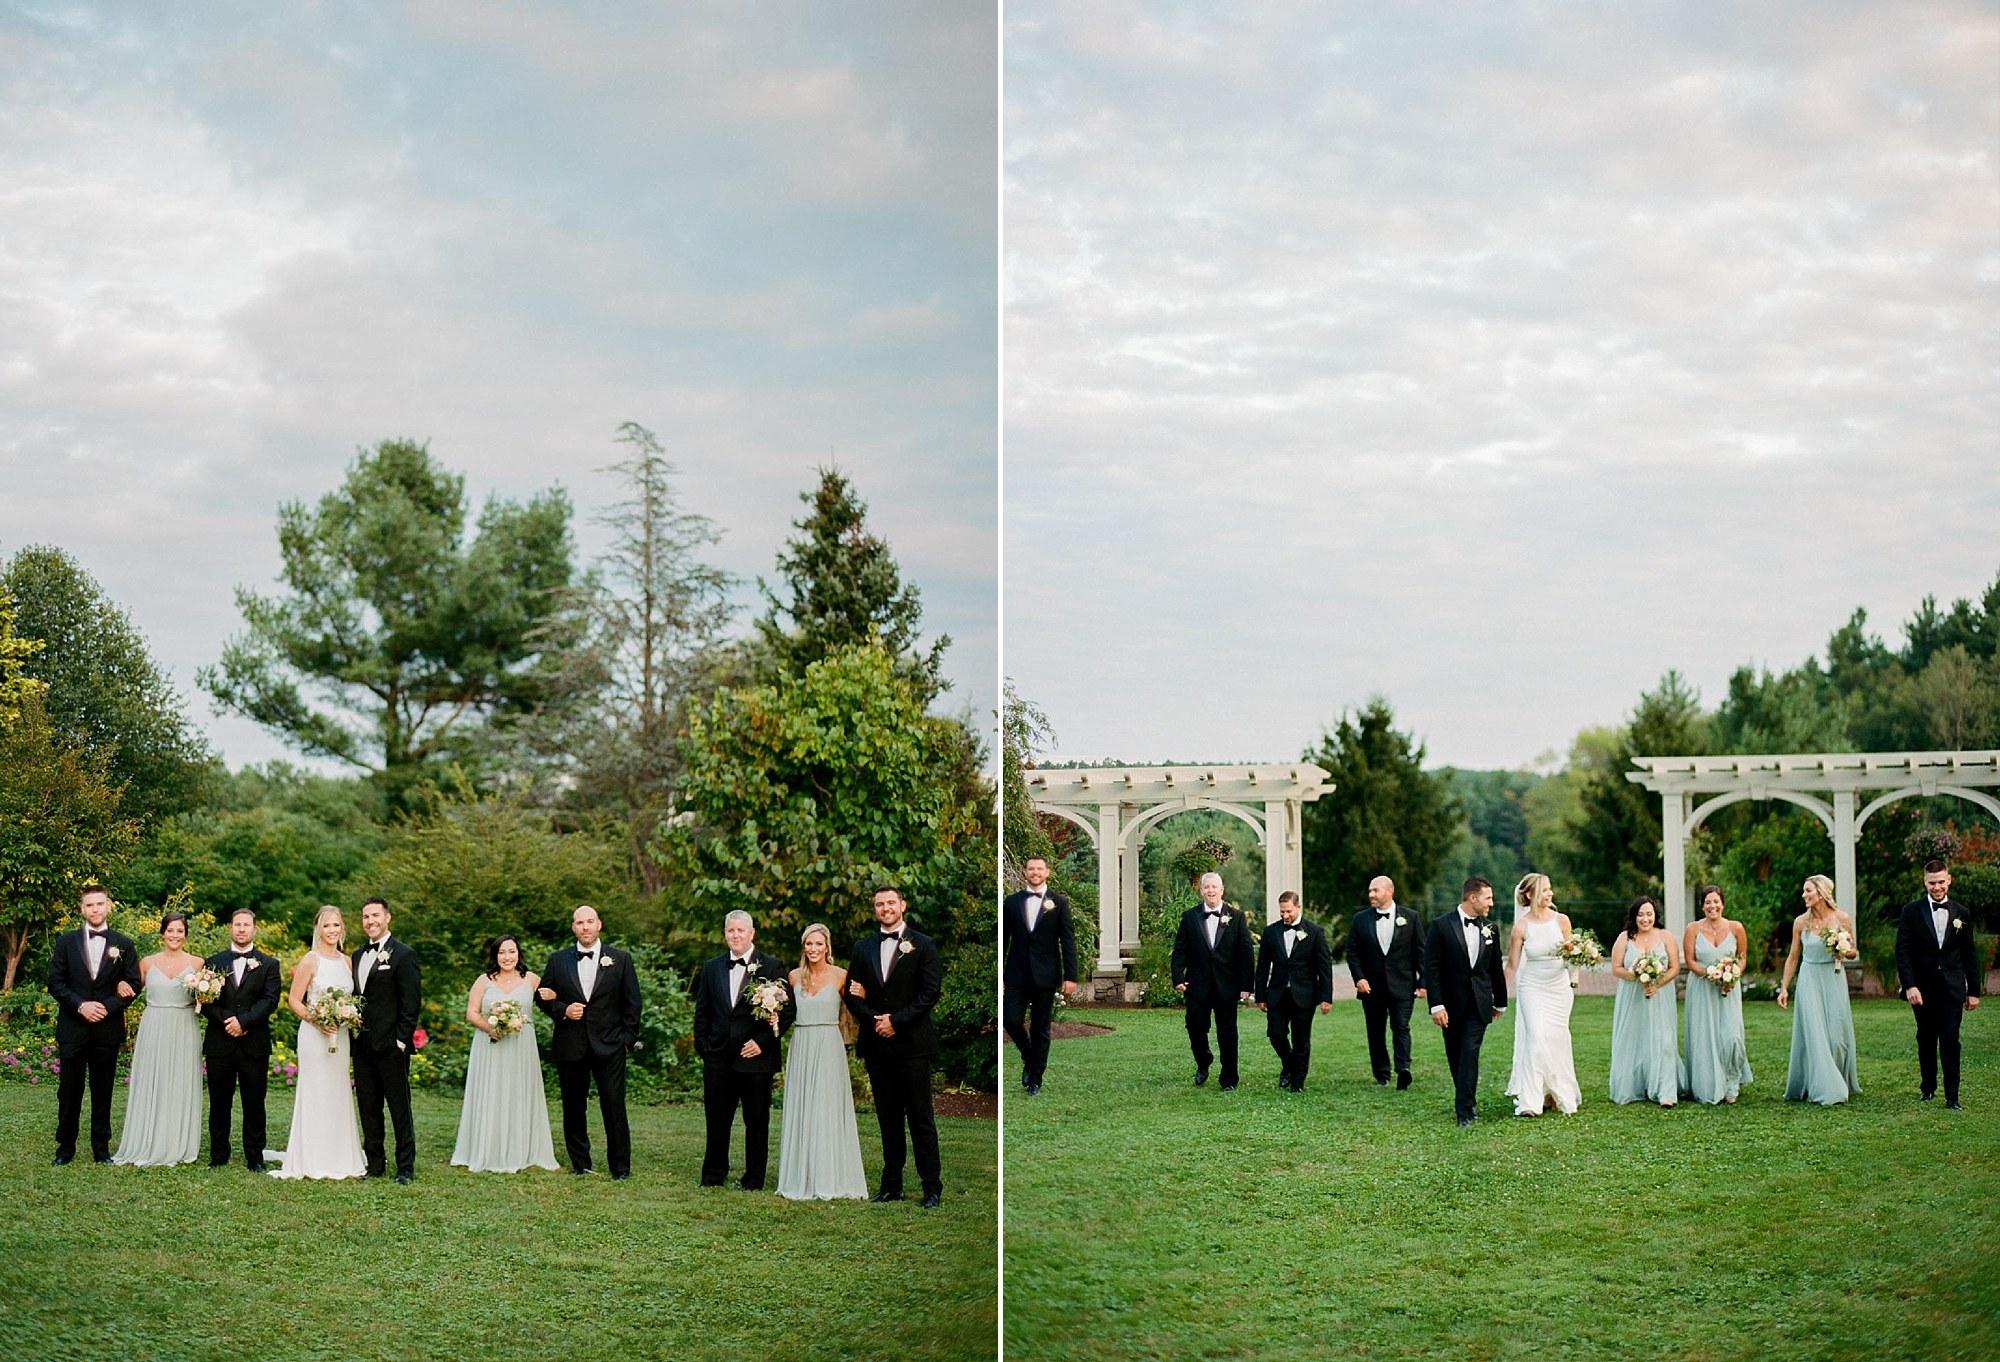 Tower hill wedding - ebersole photo-3.jpg